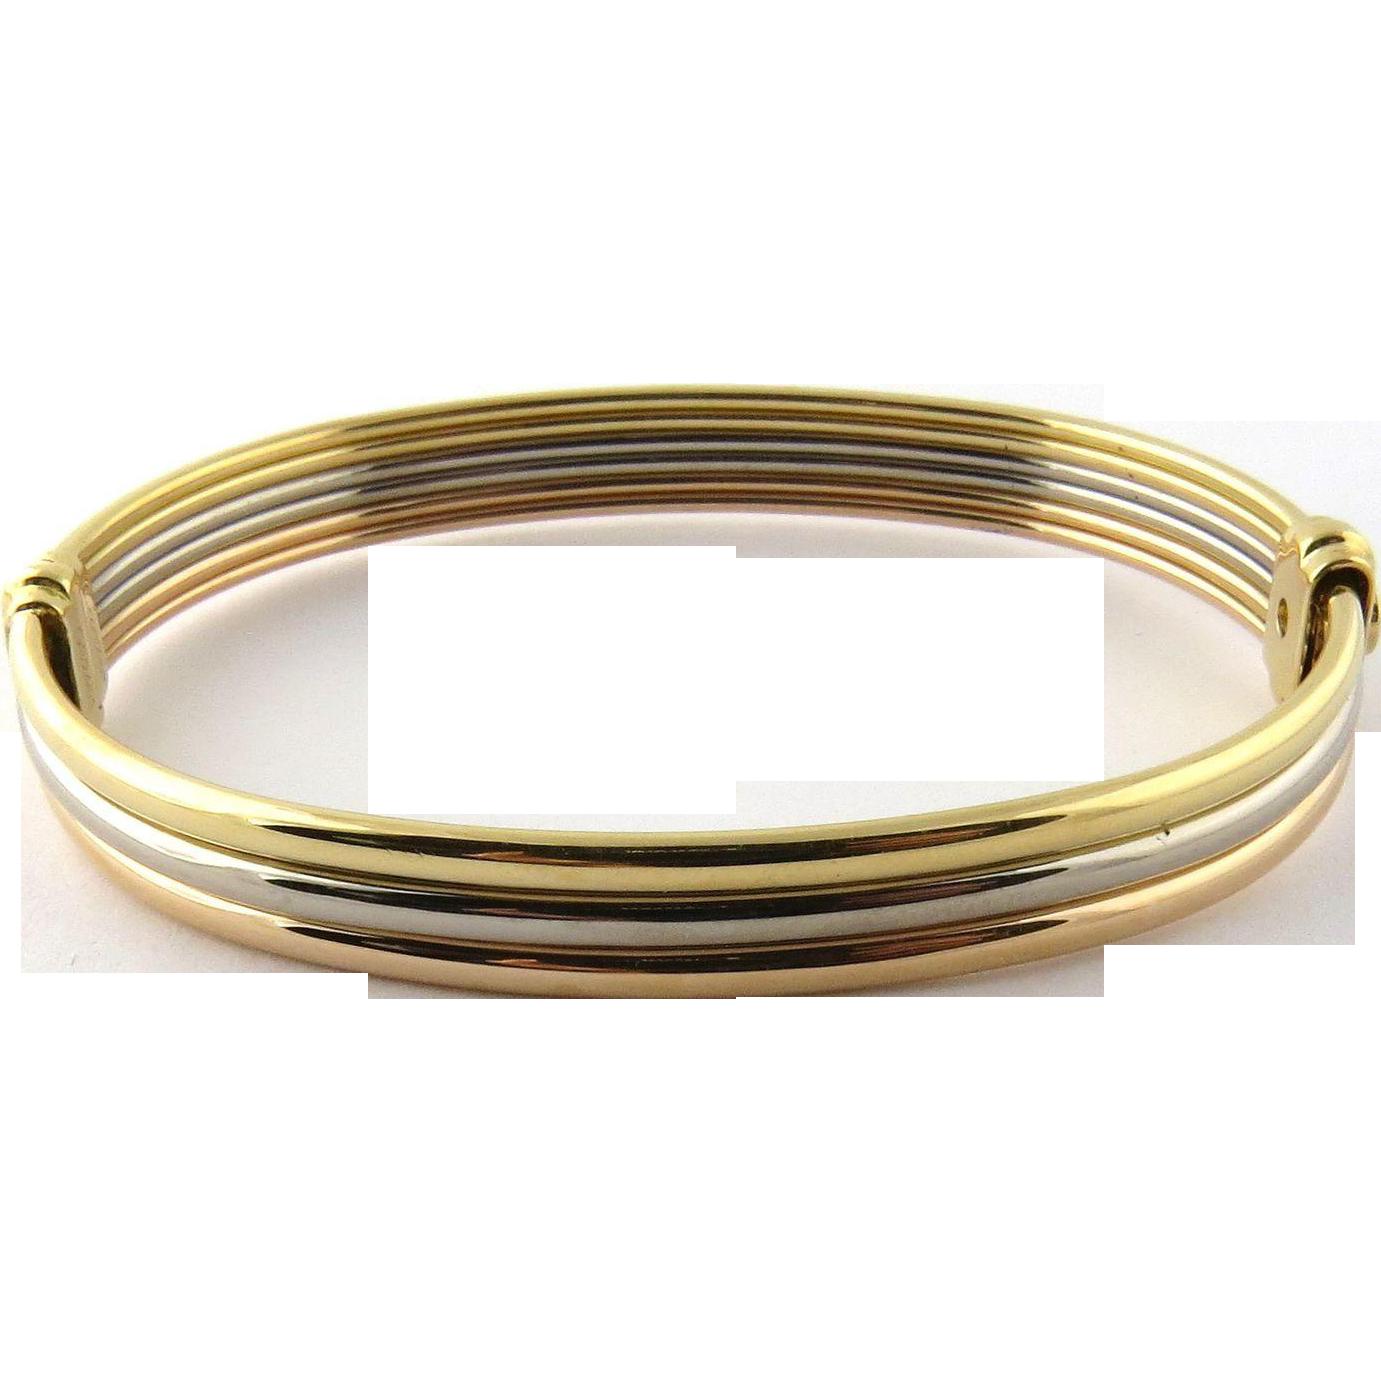 Vintage Cartier 18k Tri Color Gold Bangle Bracelet With Yellow Gold